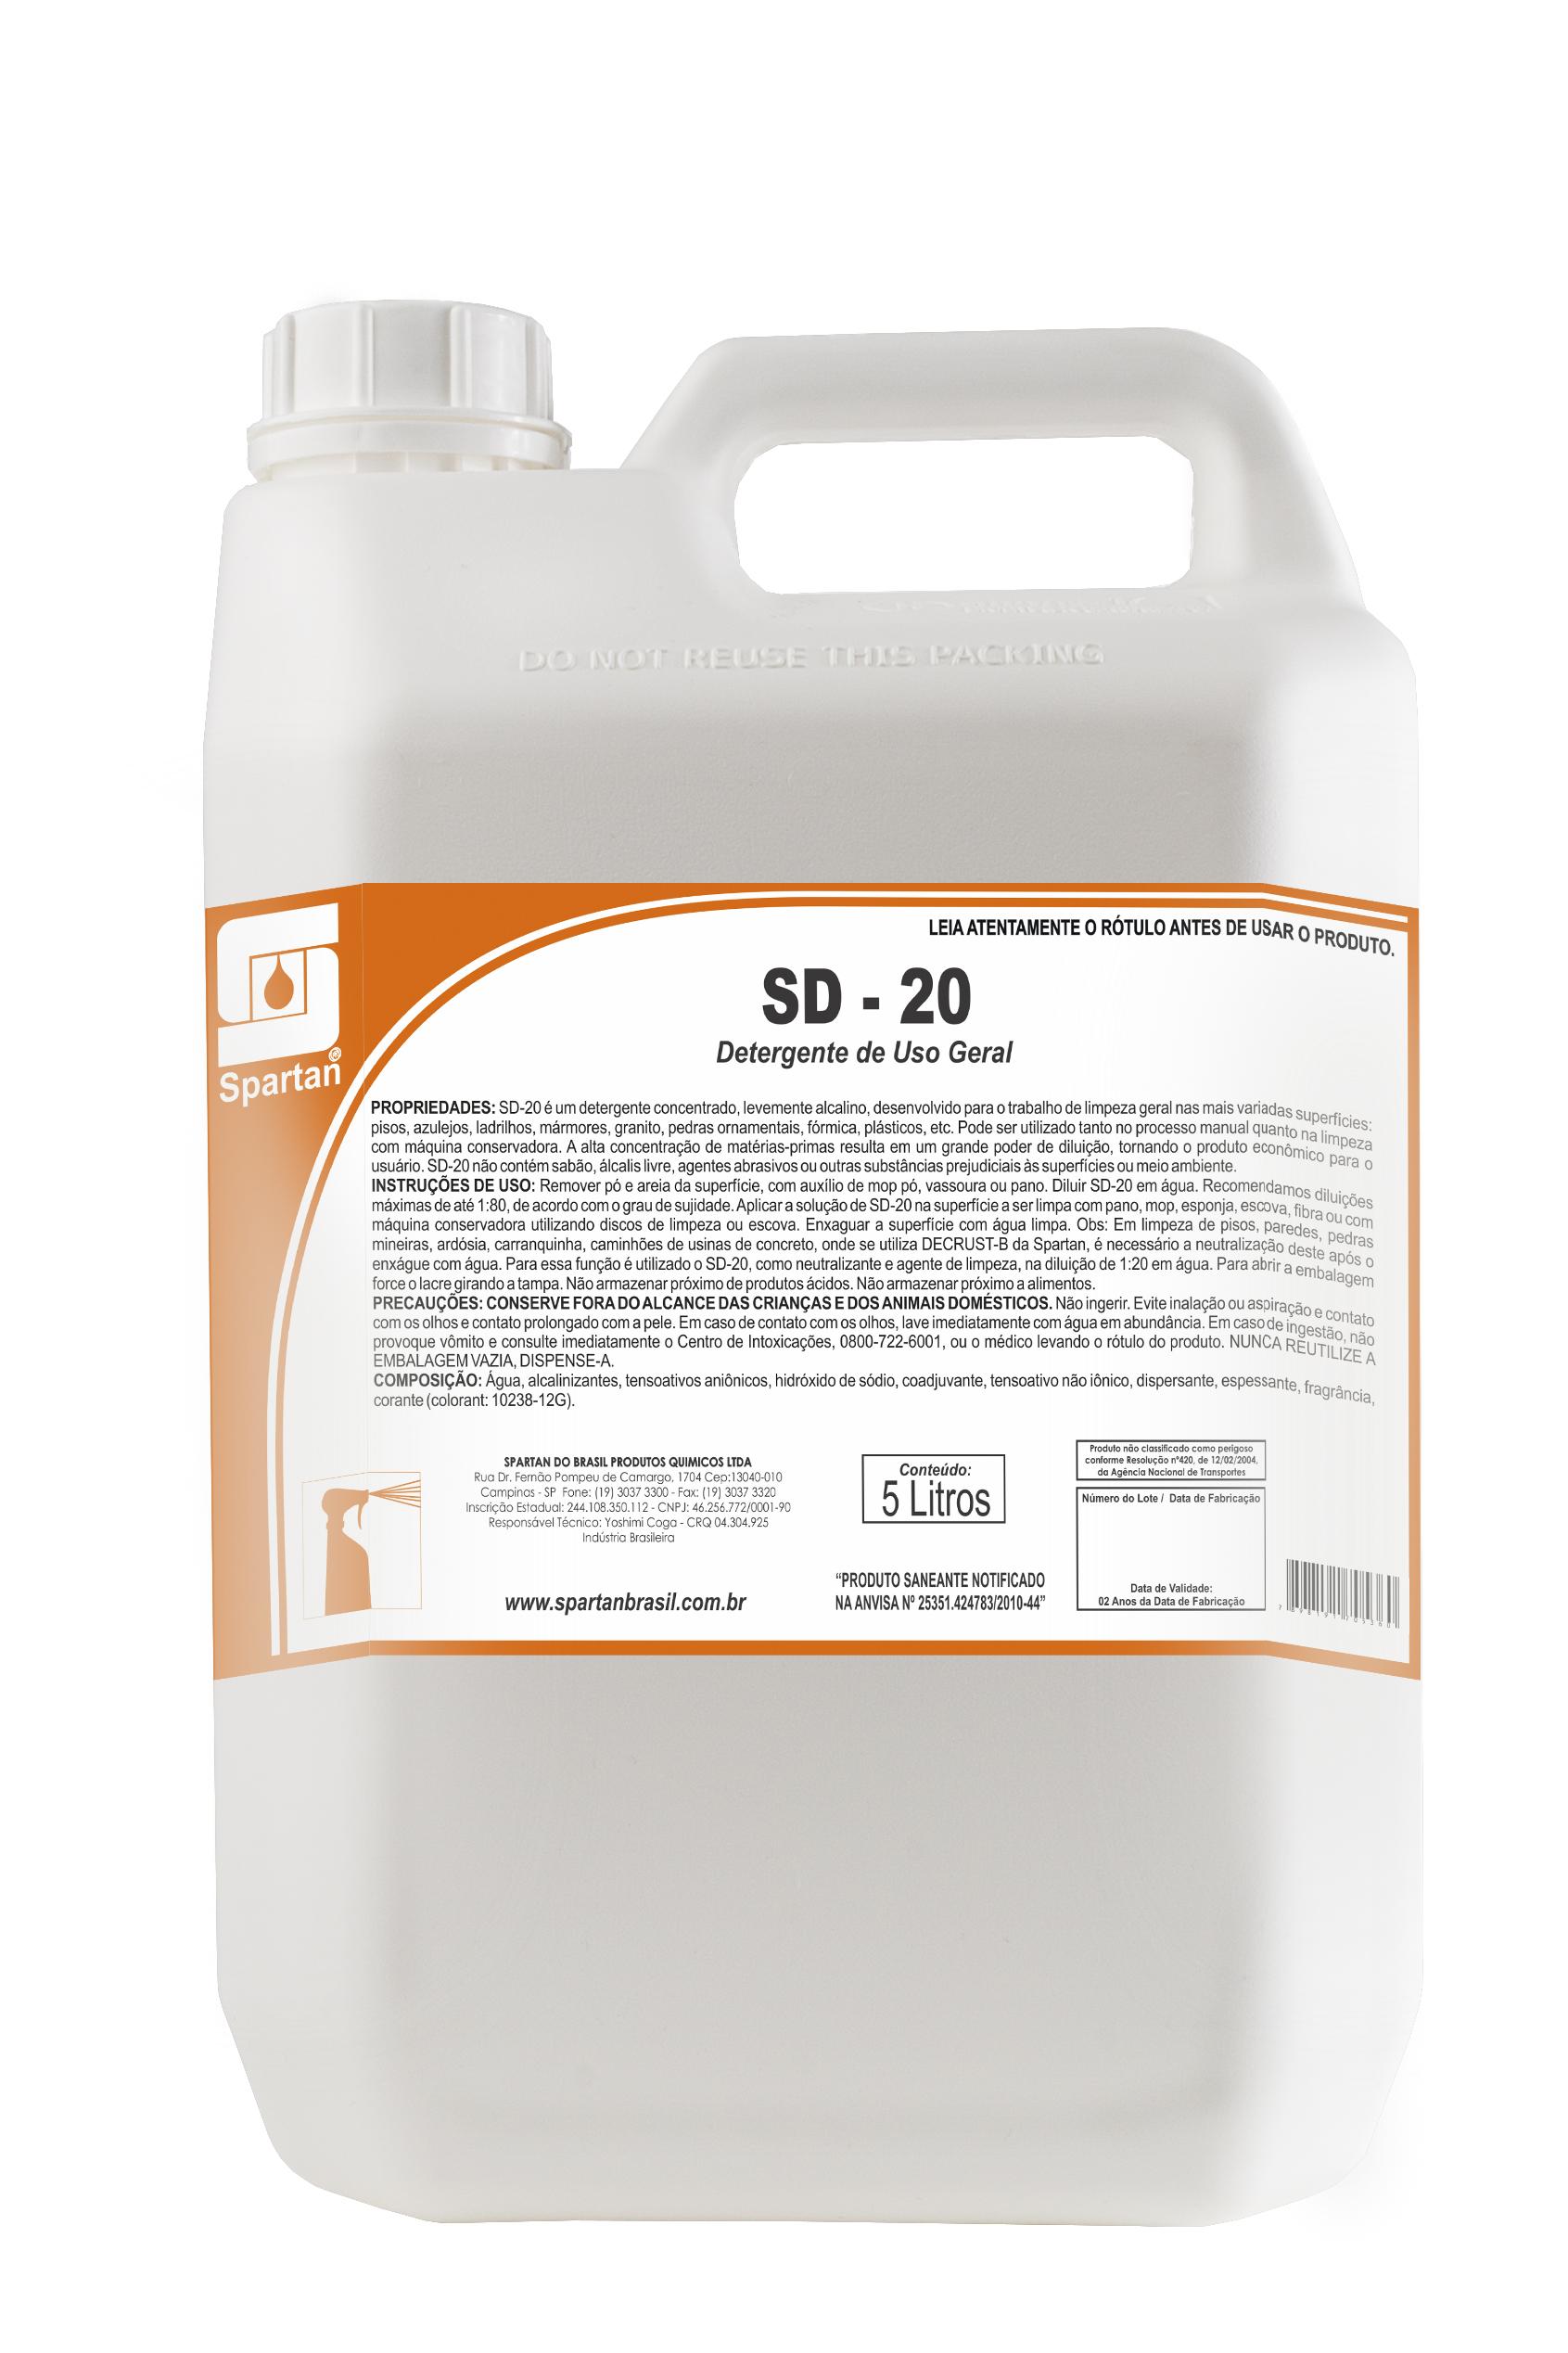 SD-20